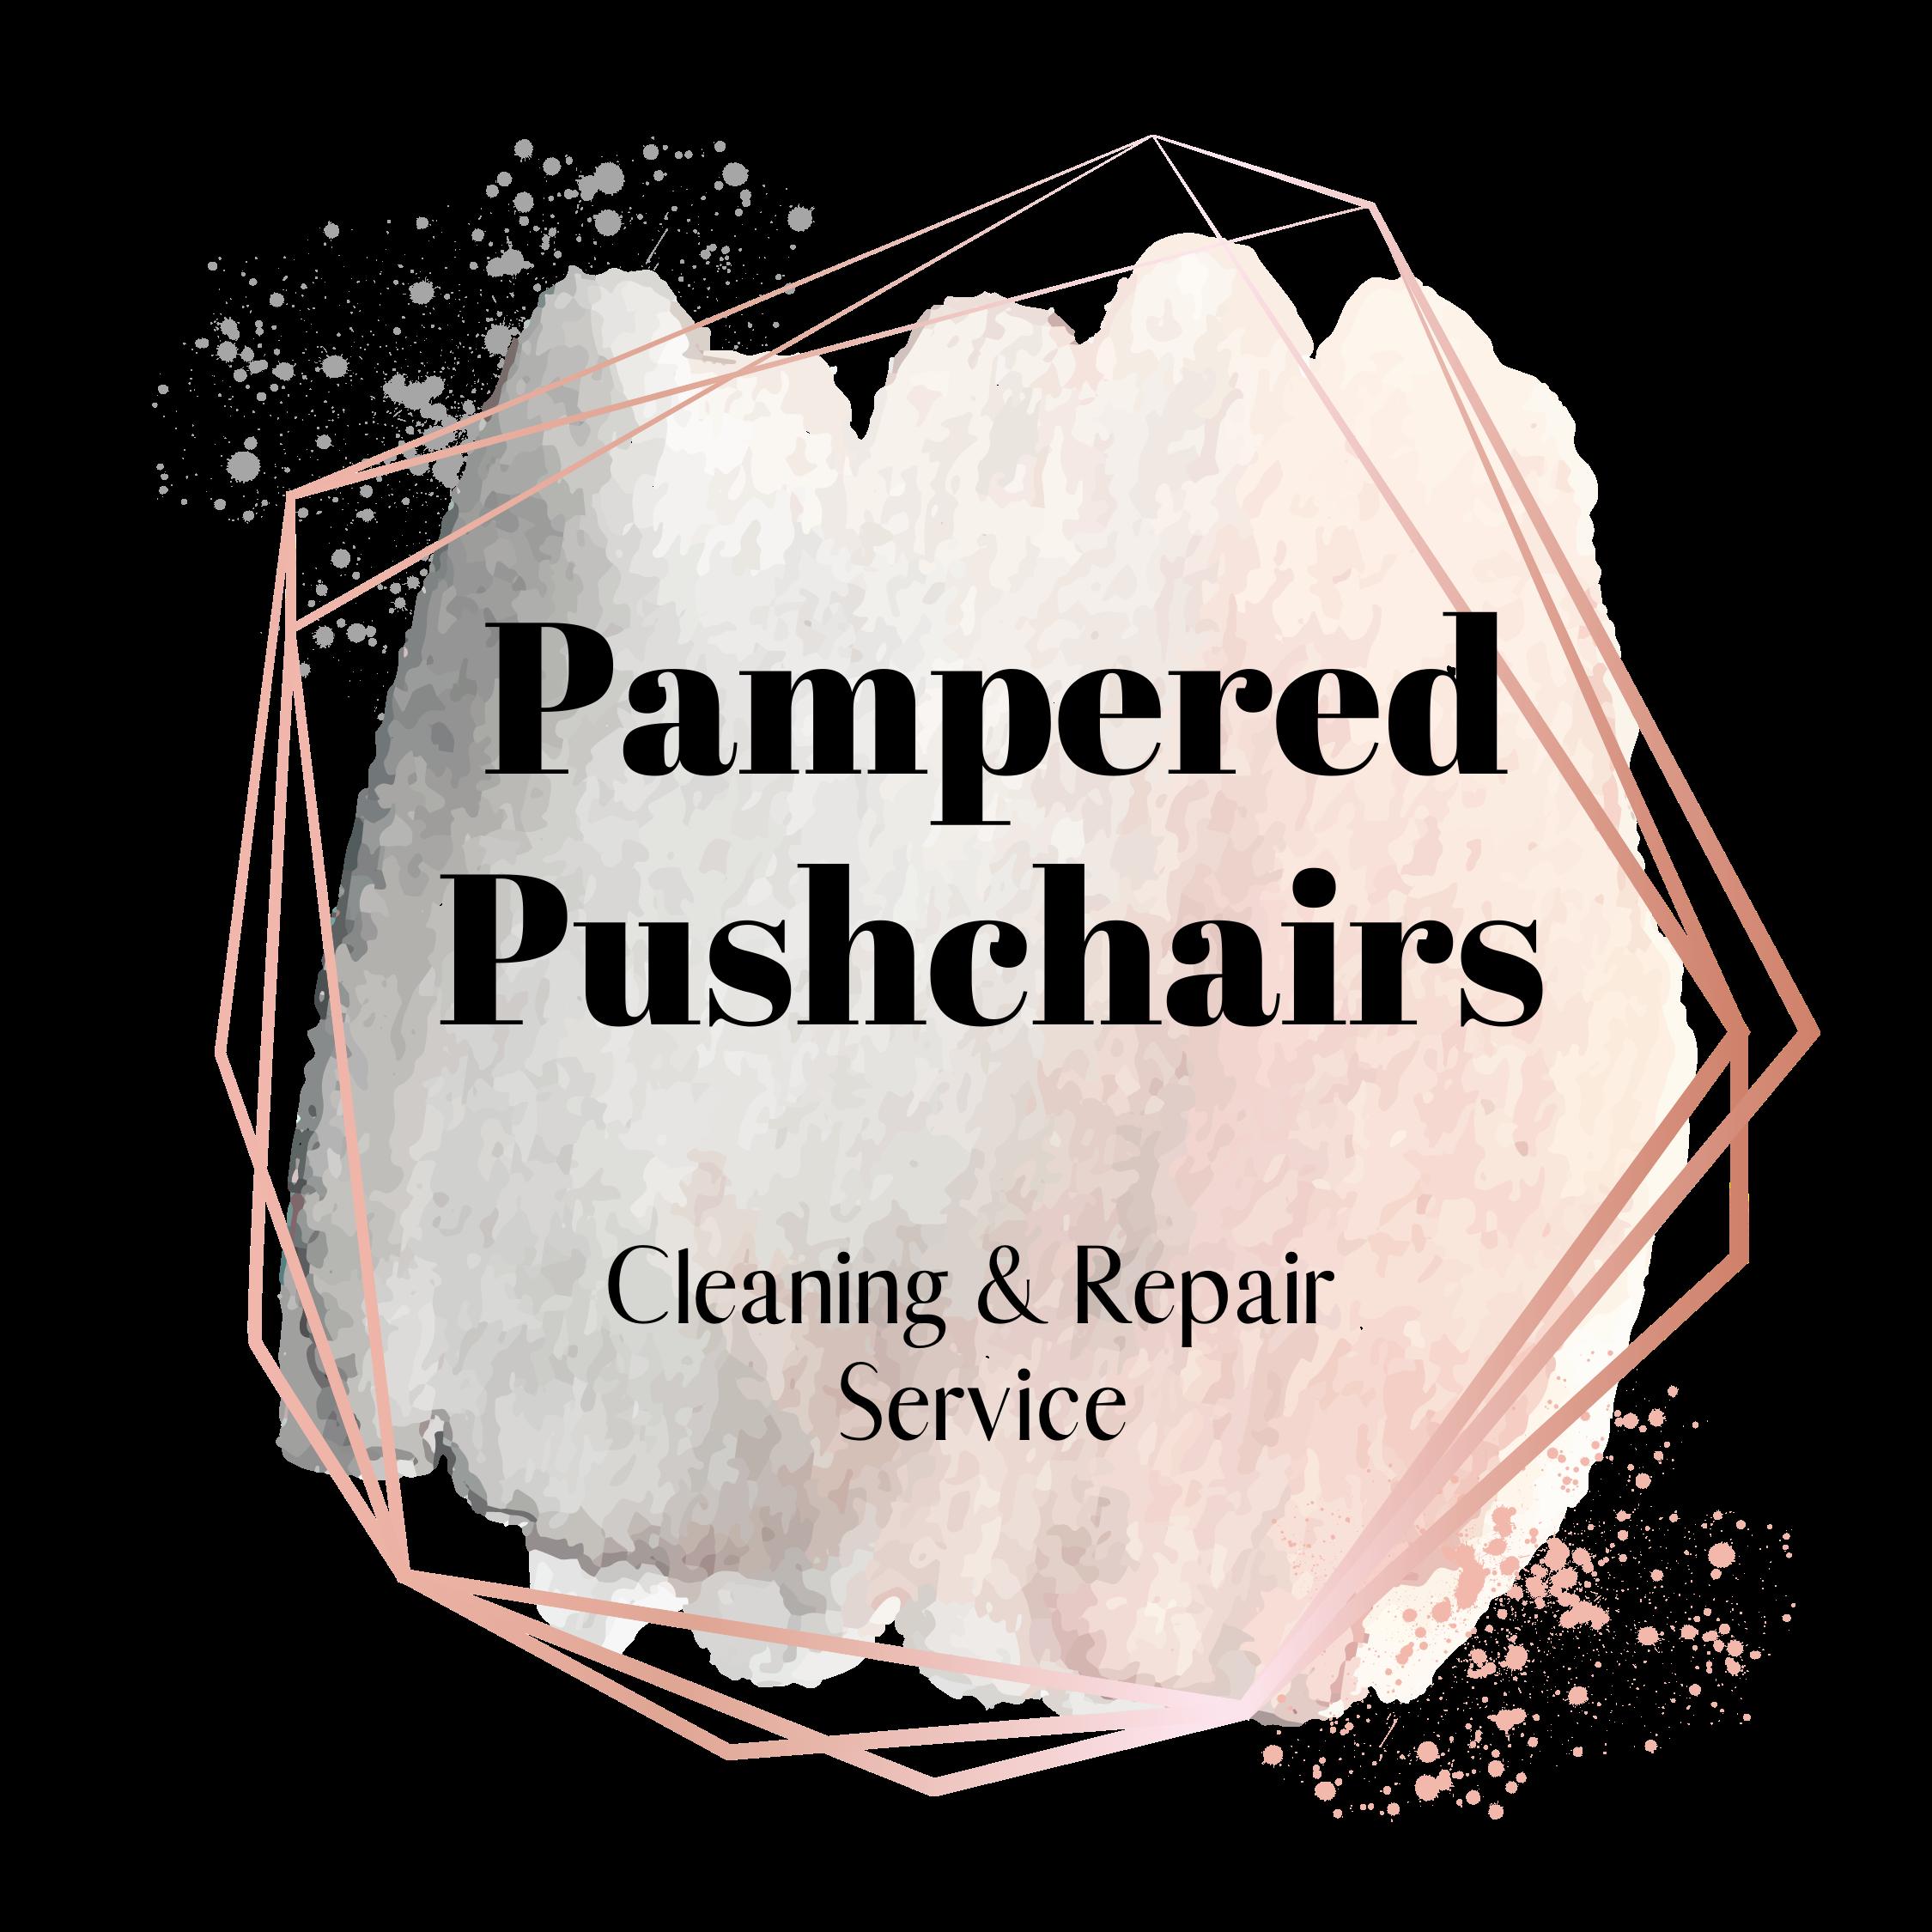 PAMPERED PUSHCHAIRS LTD